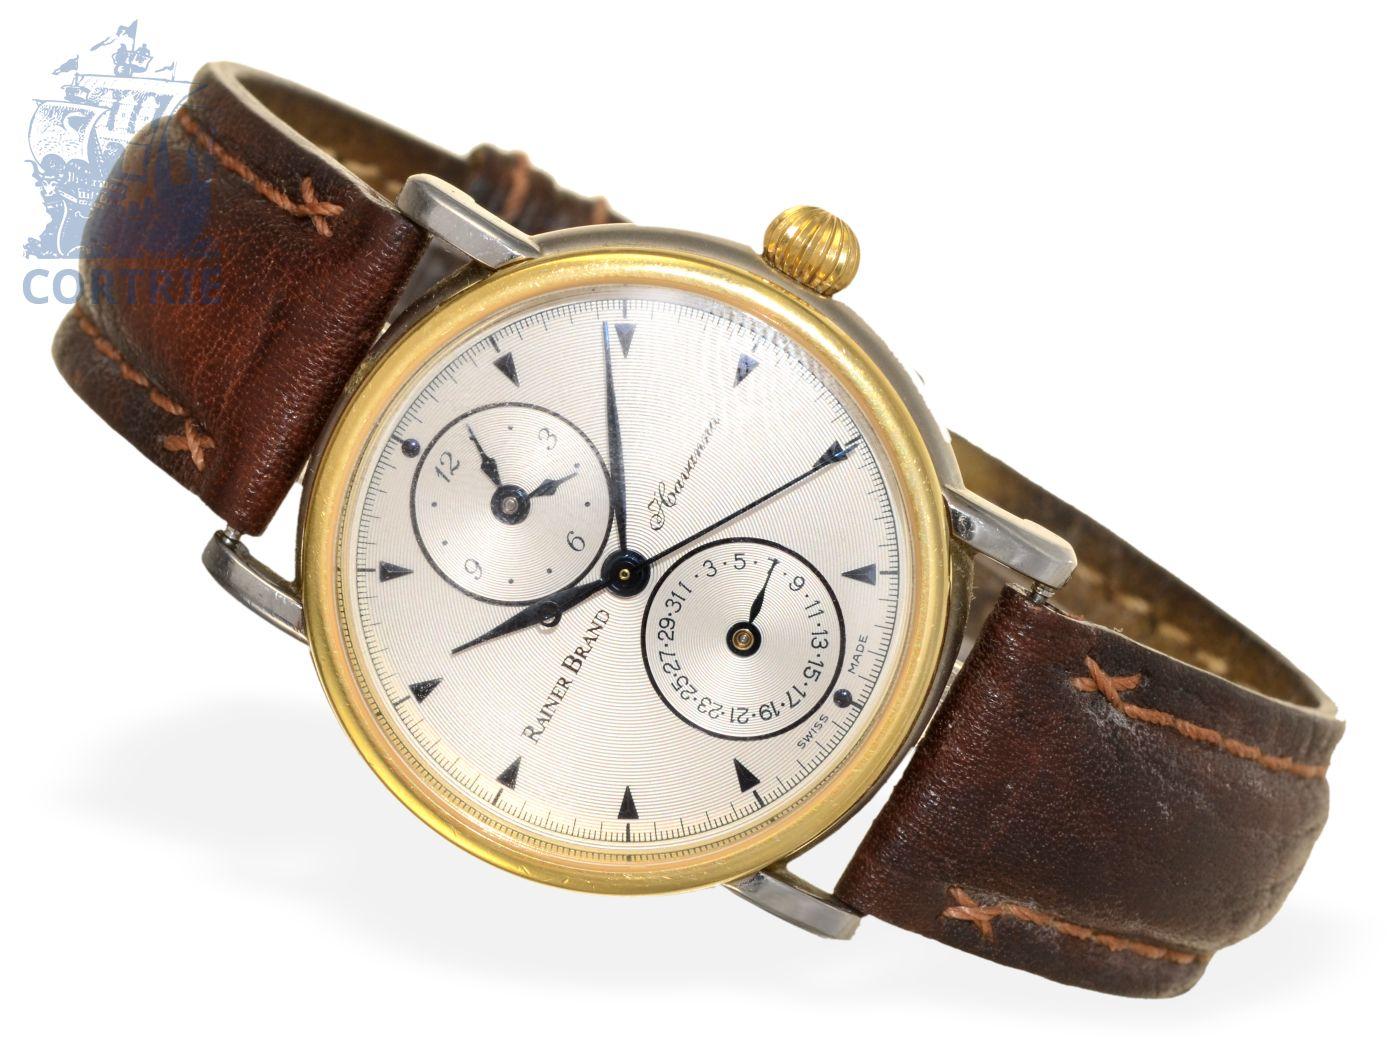 Wristwatch: elegant and very rare automatic gentlemen's watch, Rainer Brand Havanna Dualtime steel/gold-